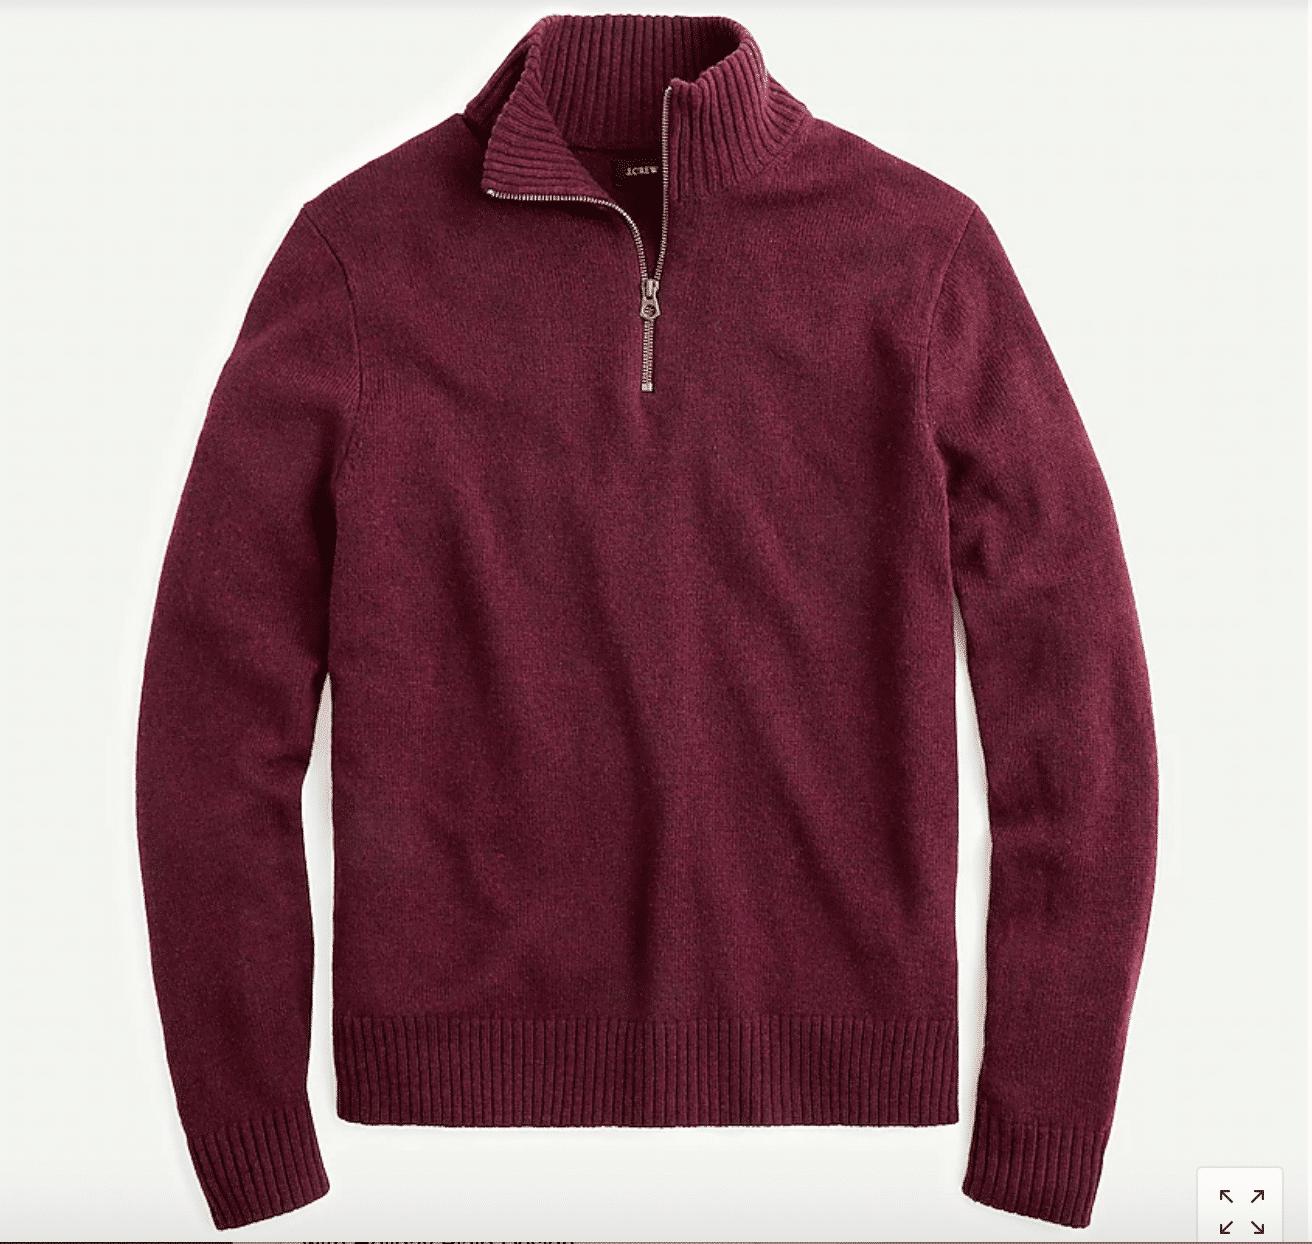 best gifts for him classic zipper sweater in dark red